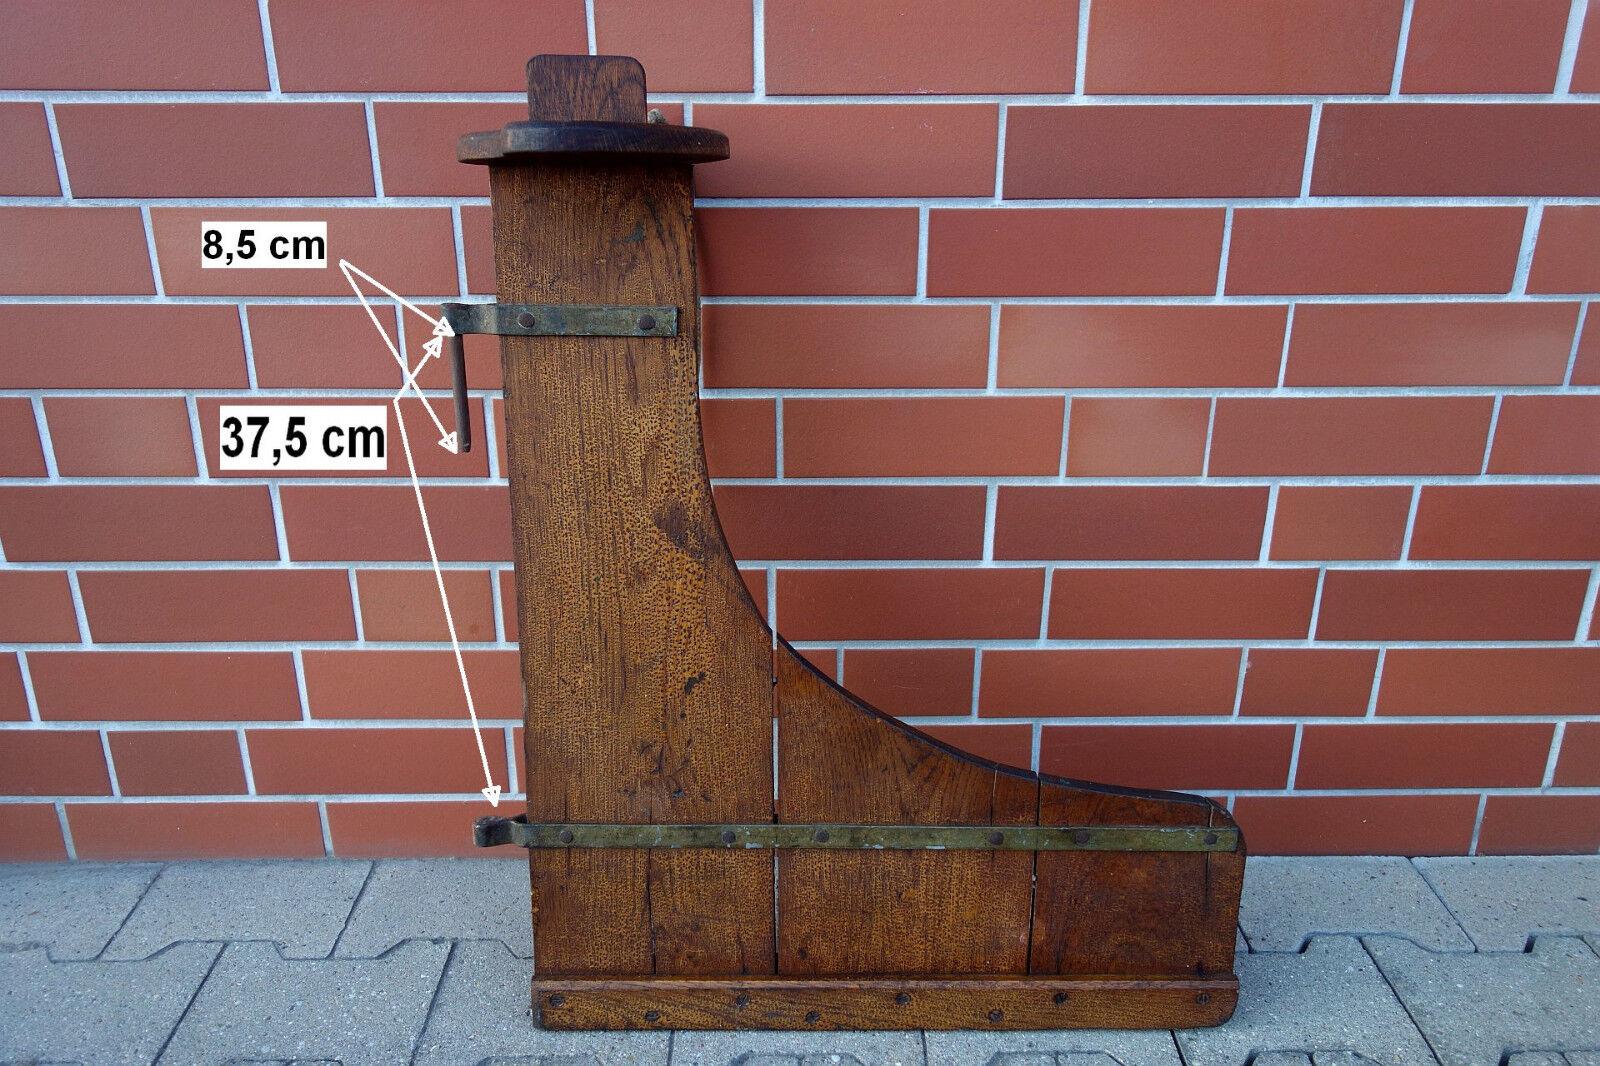 68 x 56 cm altes Ruderblatt Holz Steuerblatt Klinker Stiefel Handwerksarbeit Handwerksarbeit Stiefel 3,6 kg f7b559